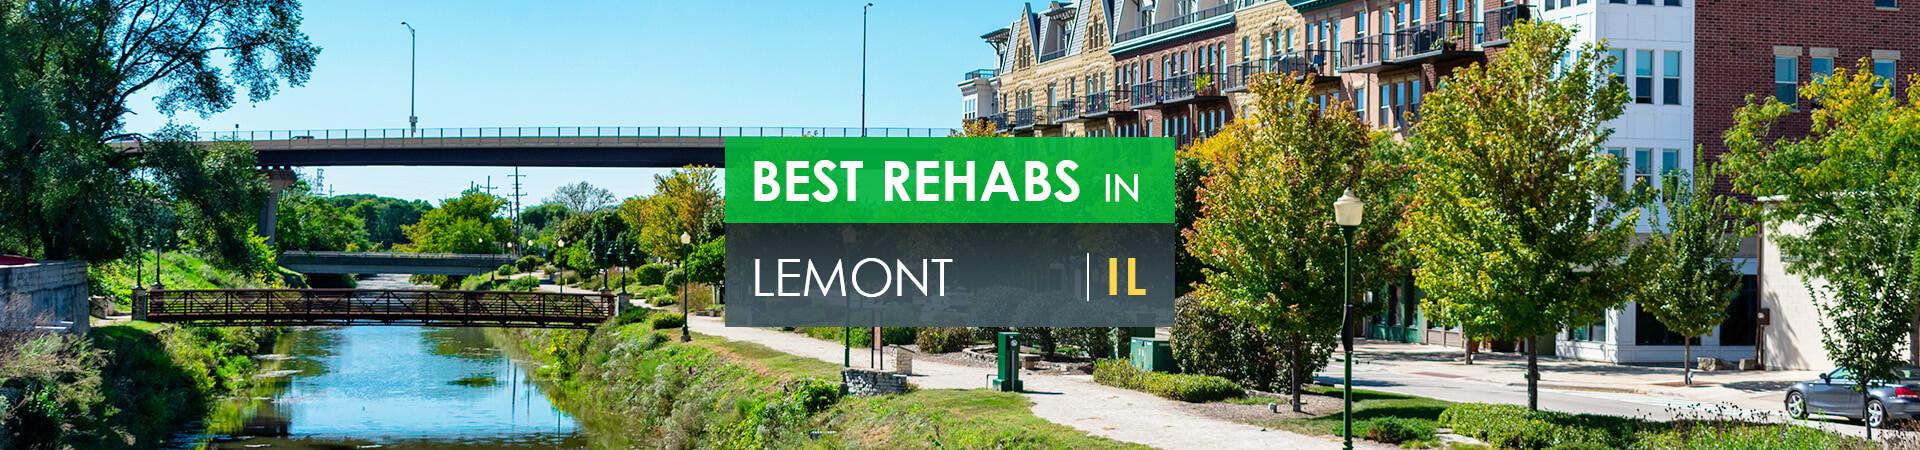 Best rehabs in Lemont, IL